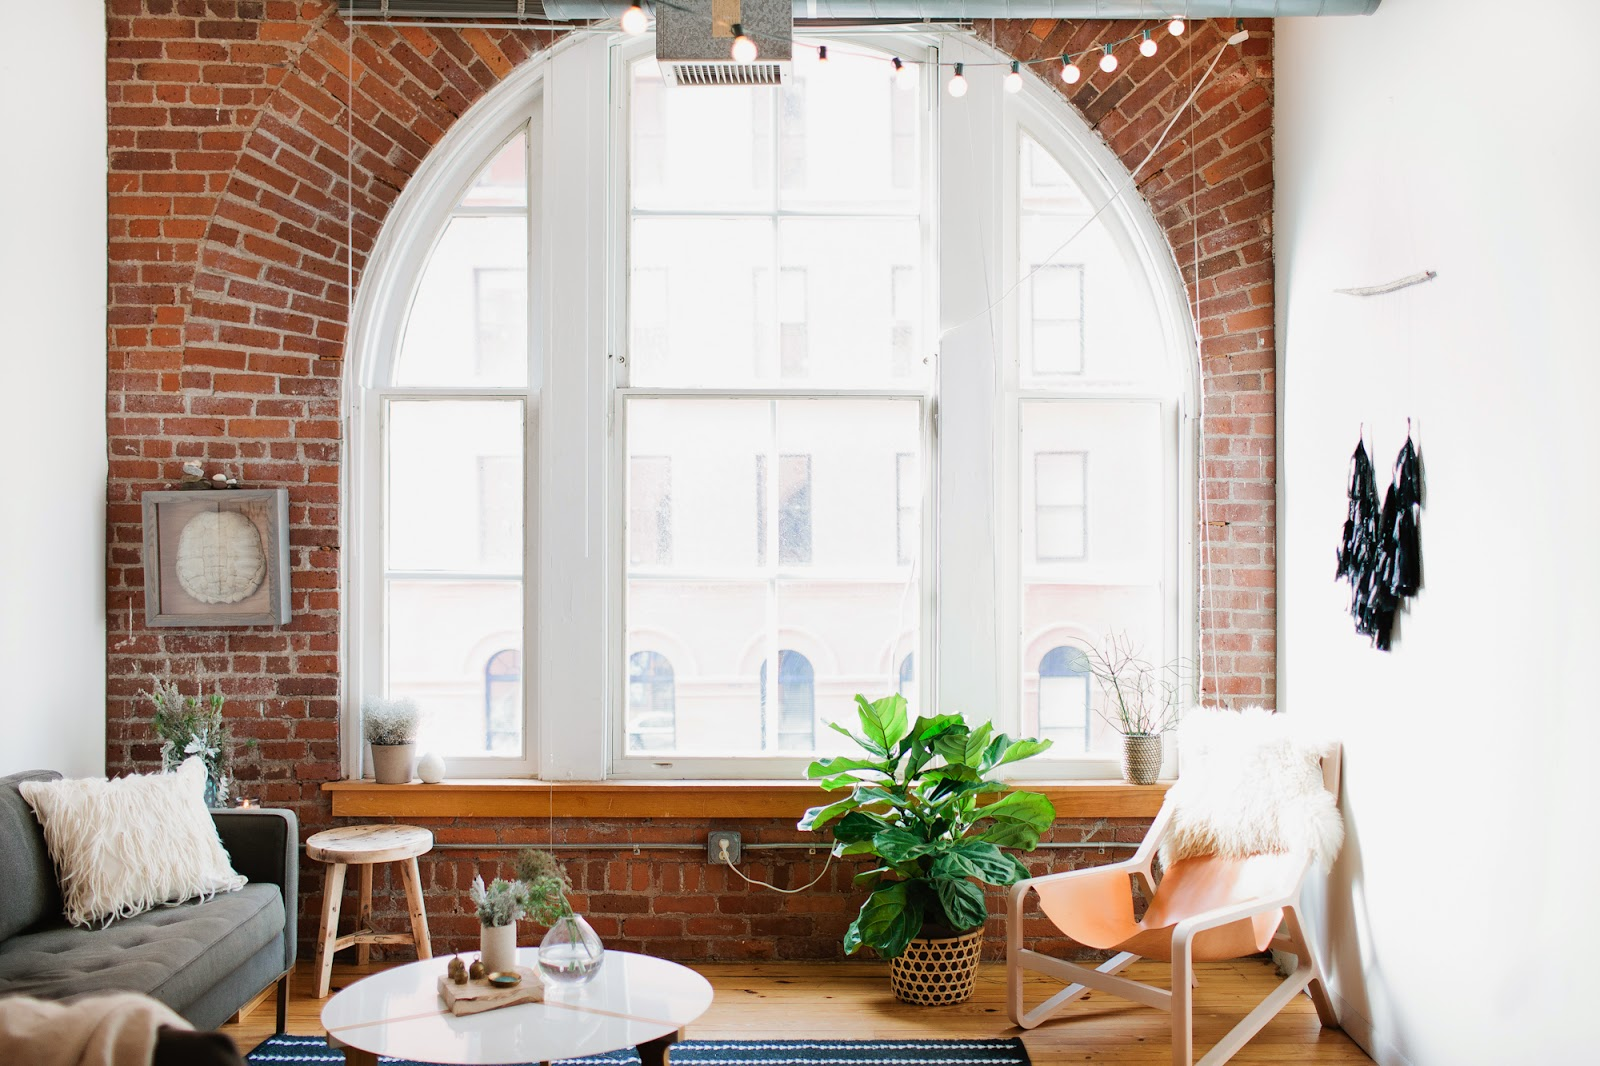 madelynn furlong loft home decor scandinavian minimal style